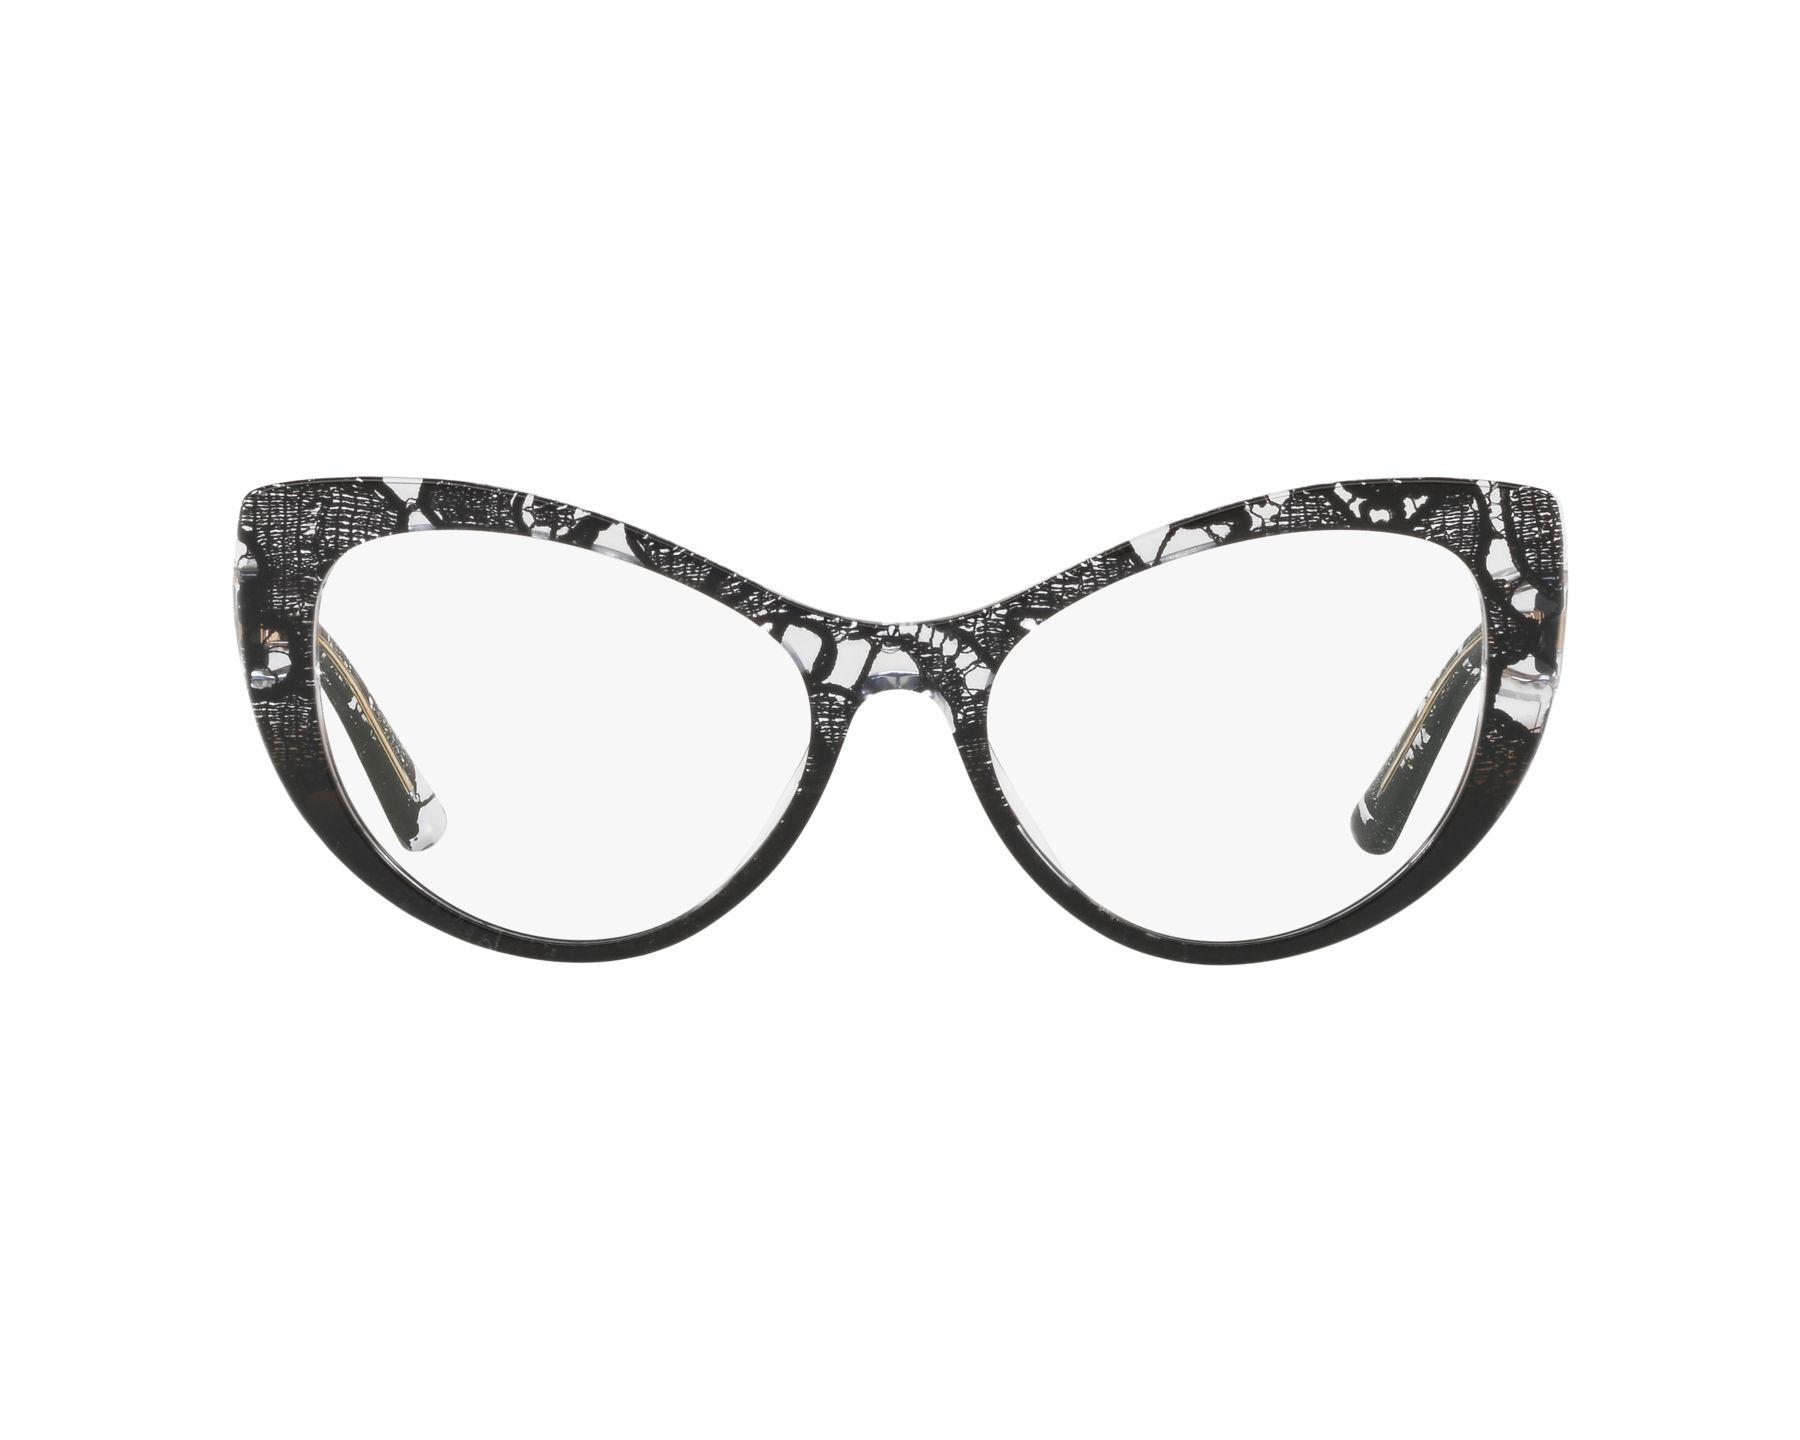 Dolce & Gabbana Eyeglasses Black DG-3285 3152 - Visionet US